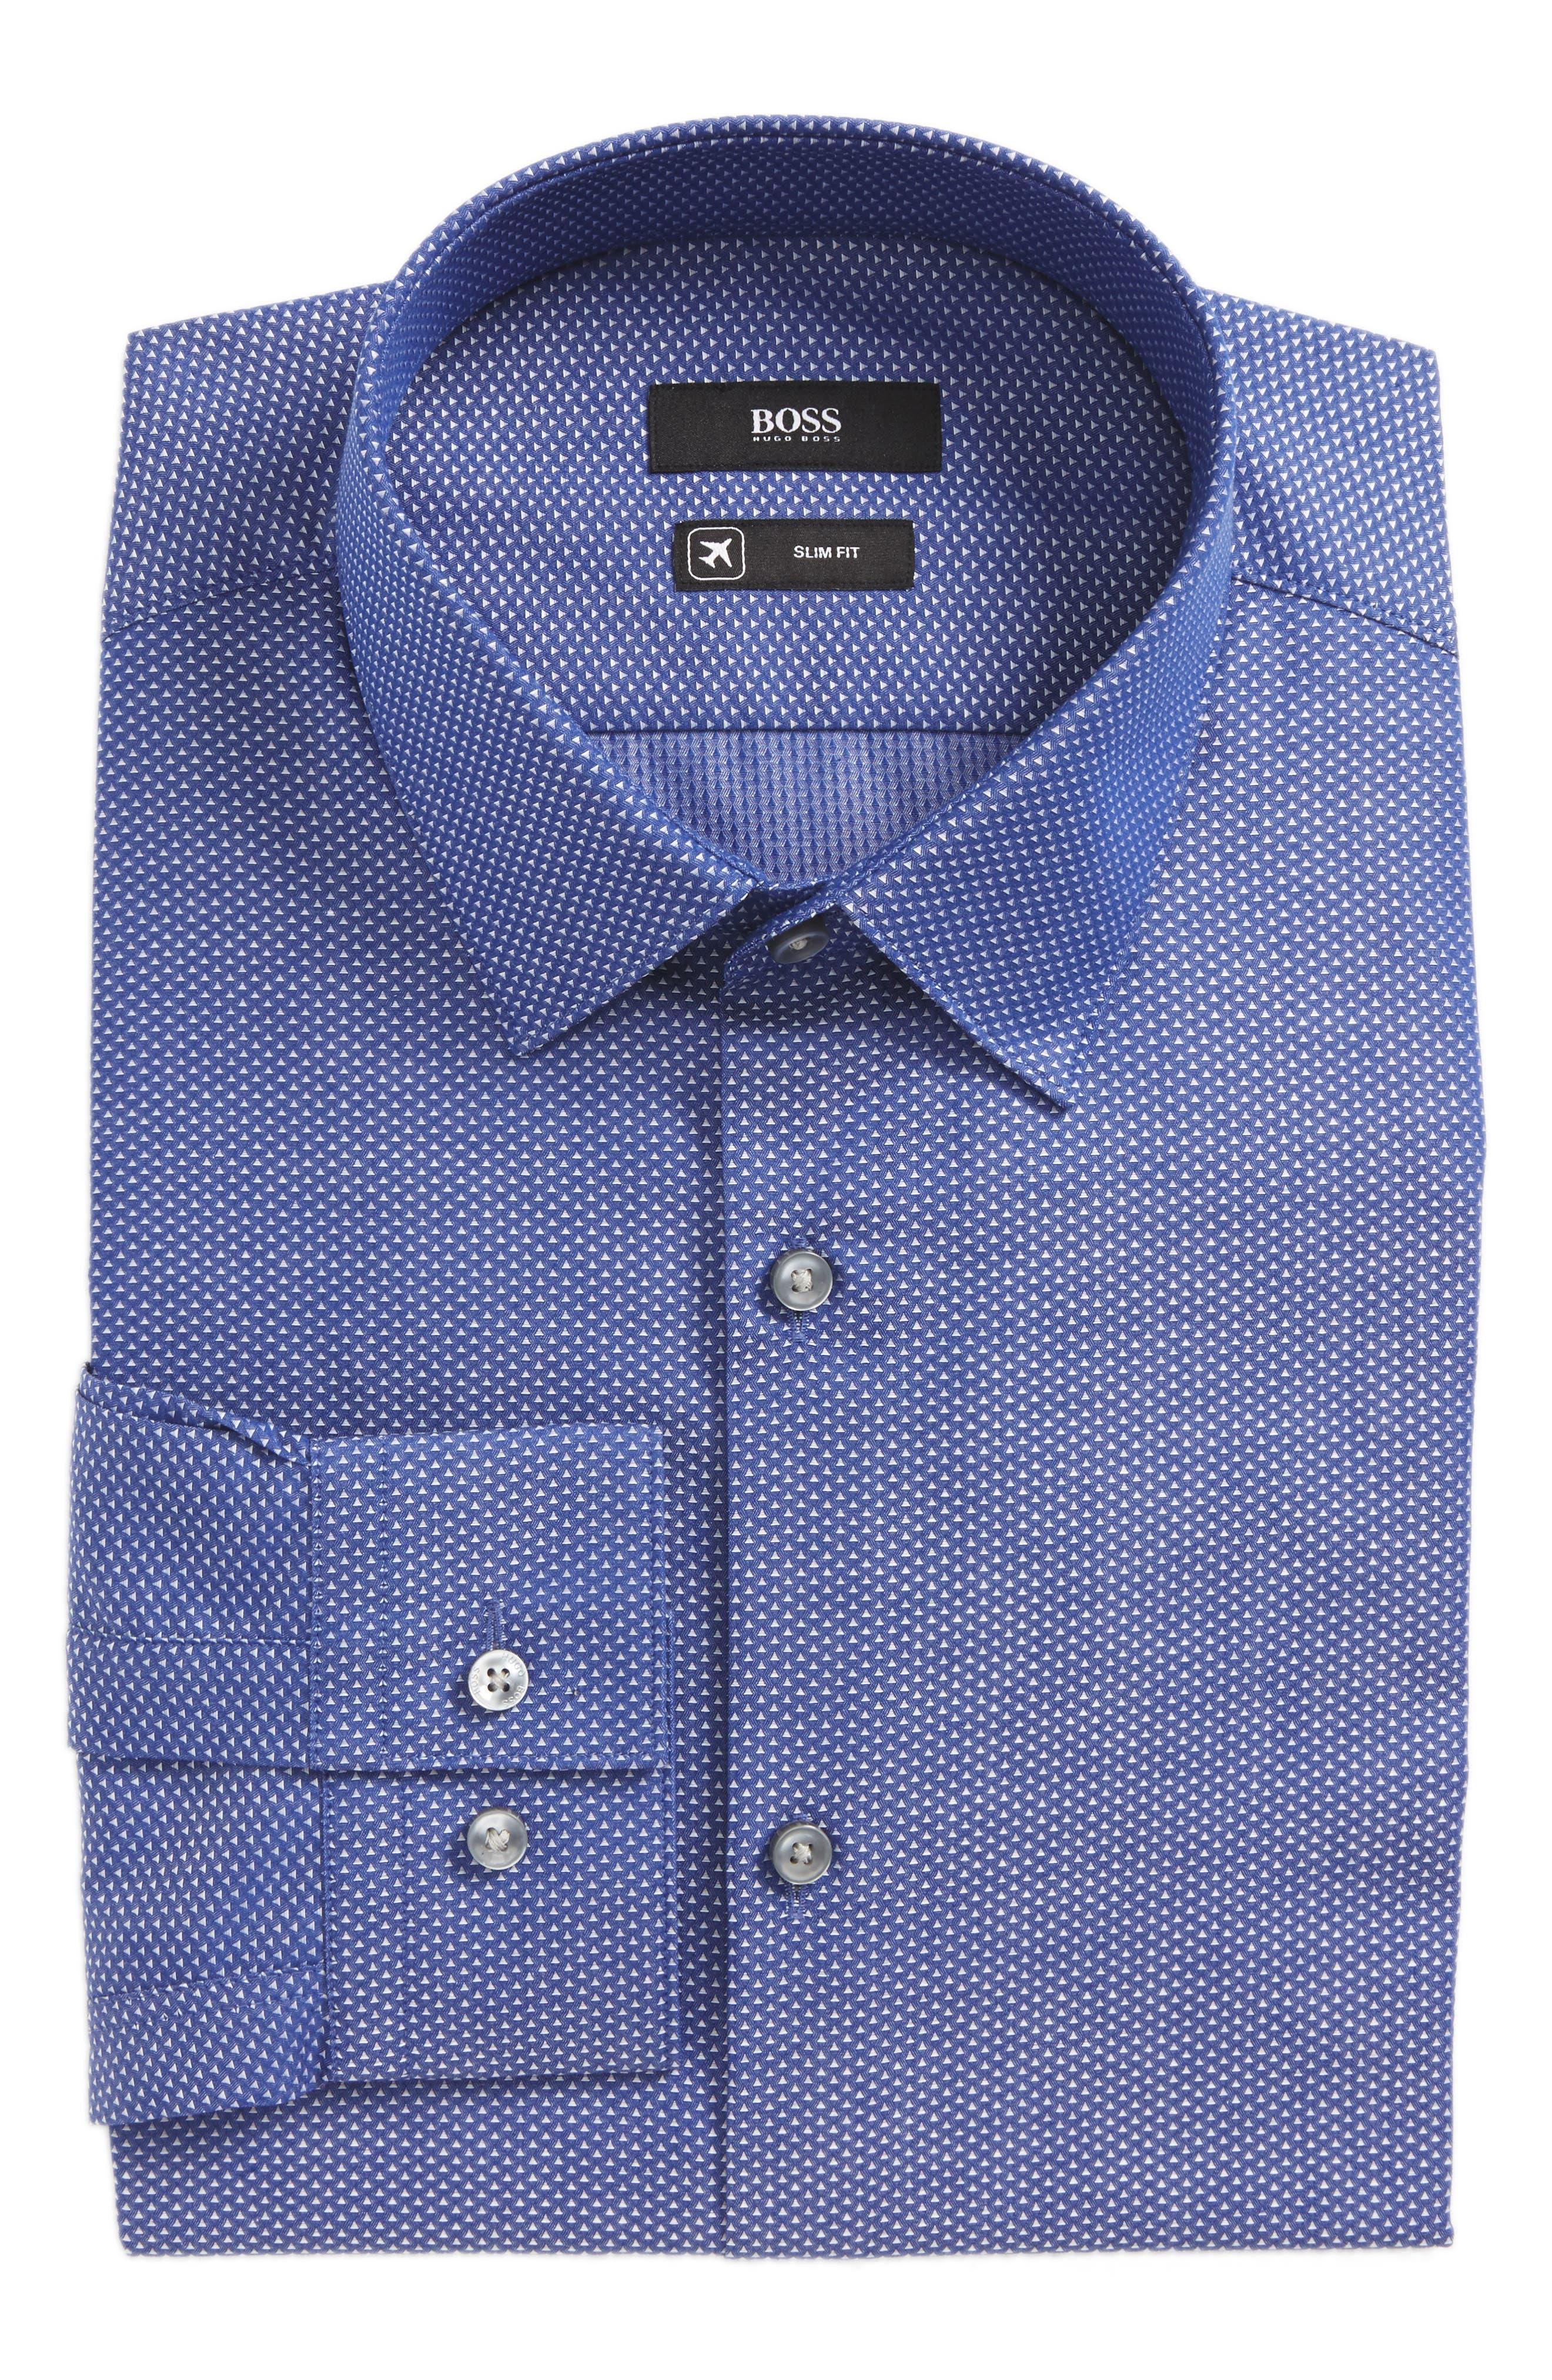 Alternate Image 1 Selected - BOSS Isko Slim Fit Geometric Dress Shirt